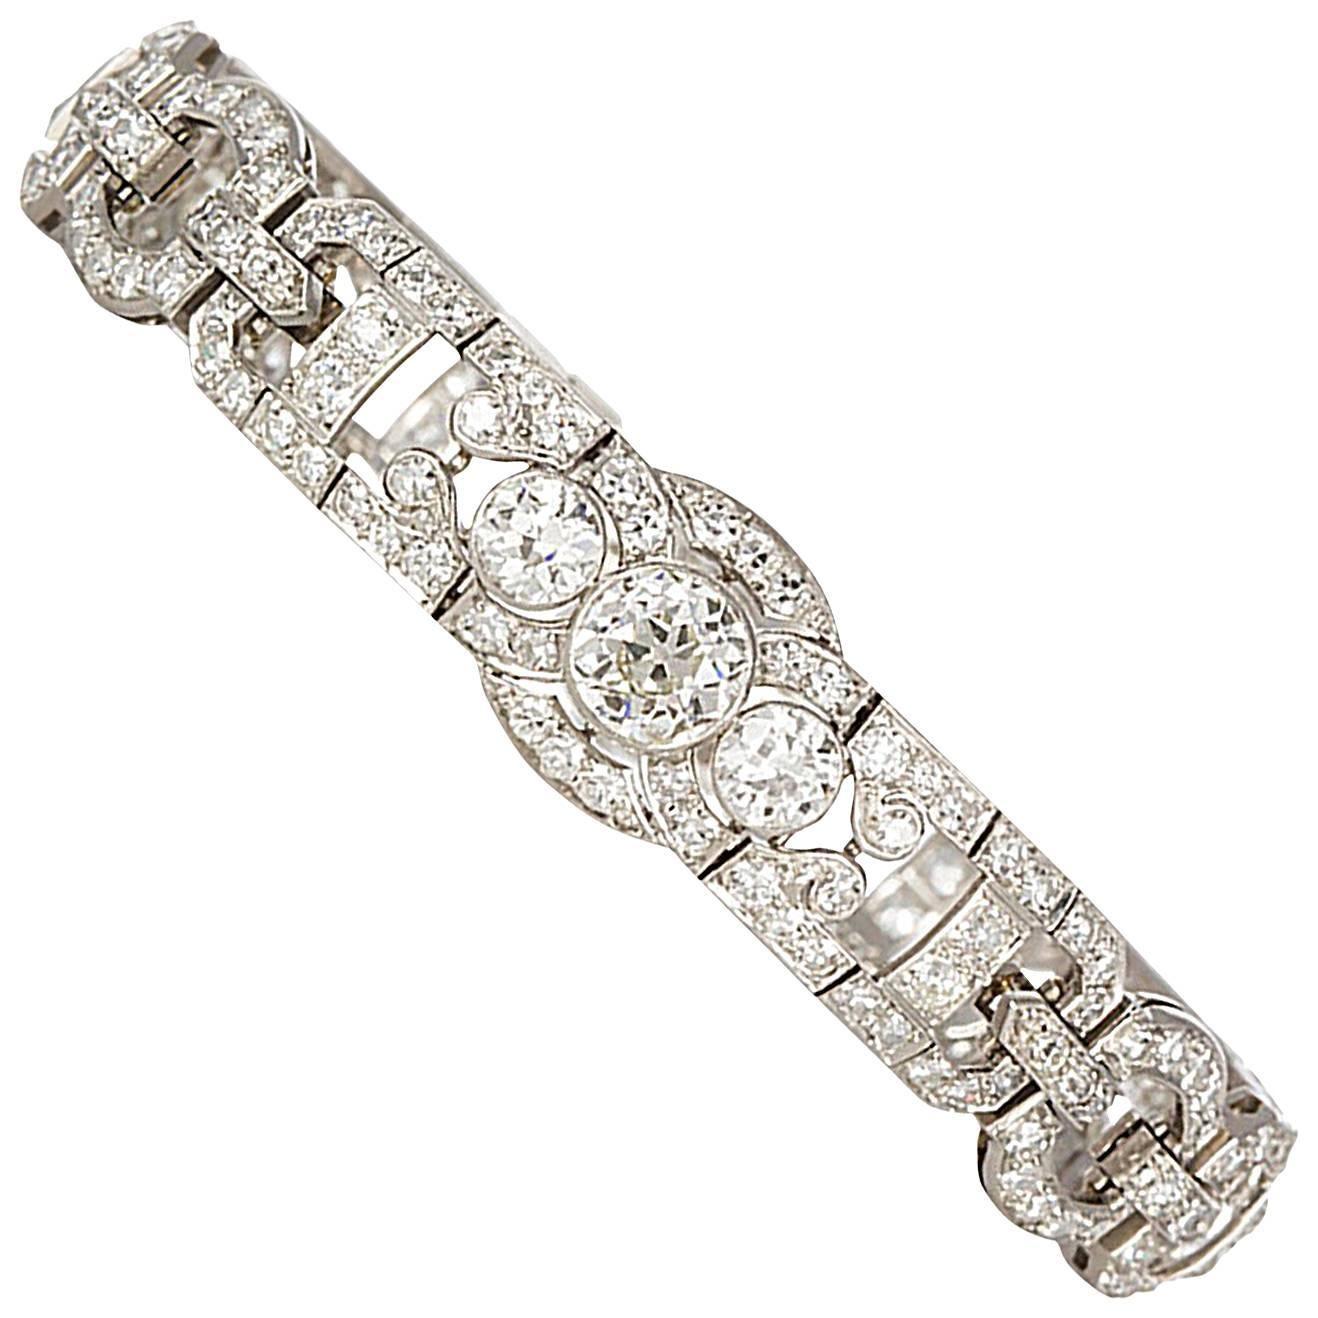 Art Deco Diamond and Platinum Bracelet 10.19 Carat